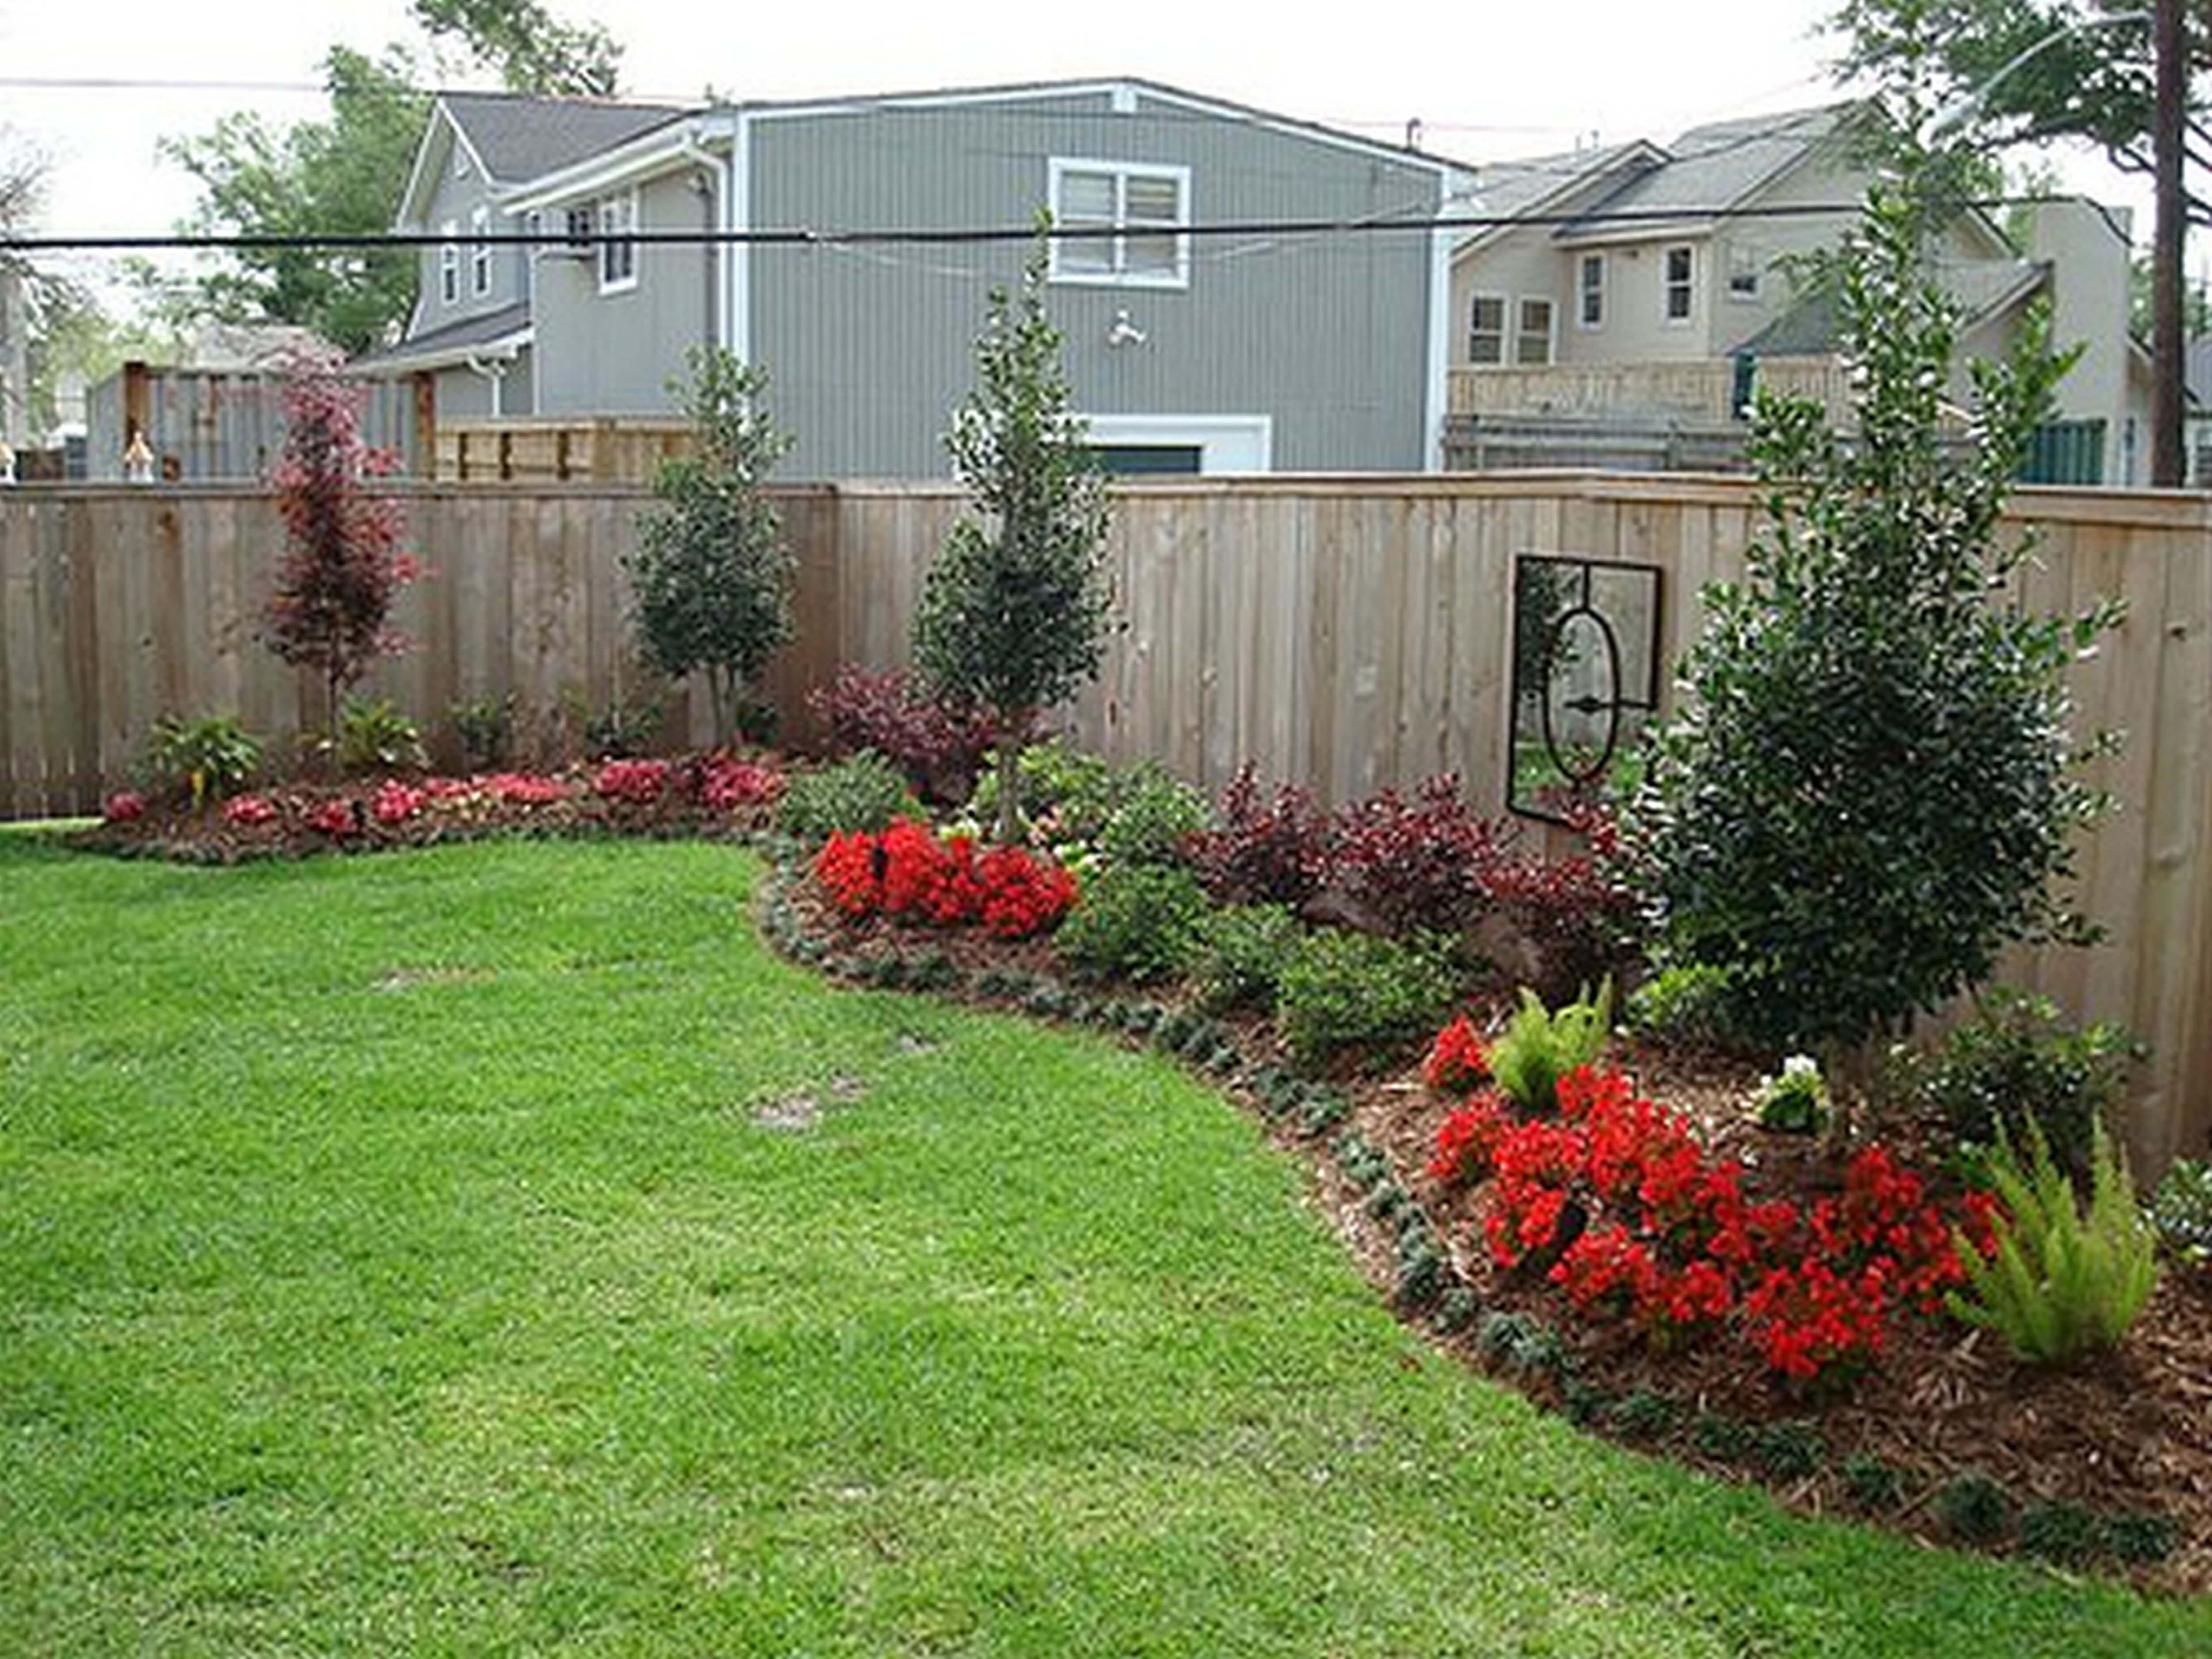 Simple backyard landscaping ideas pictures http backyardidea net backyard